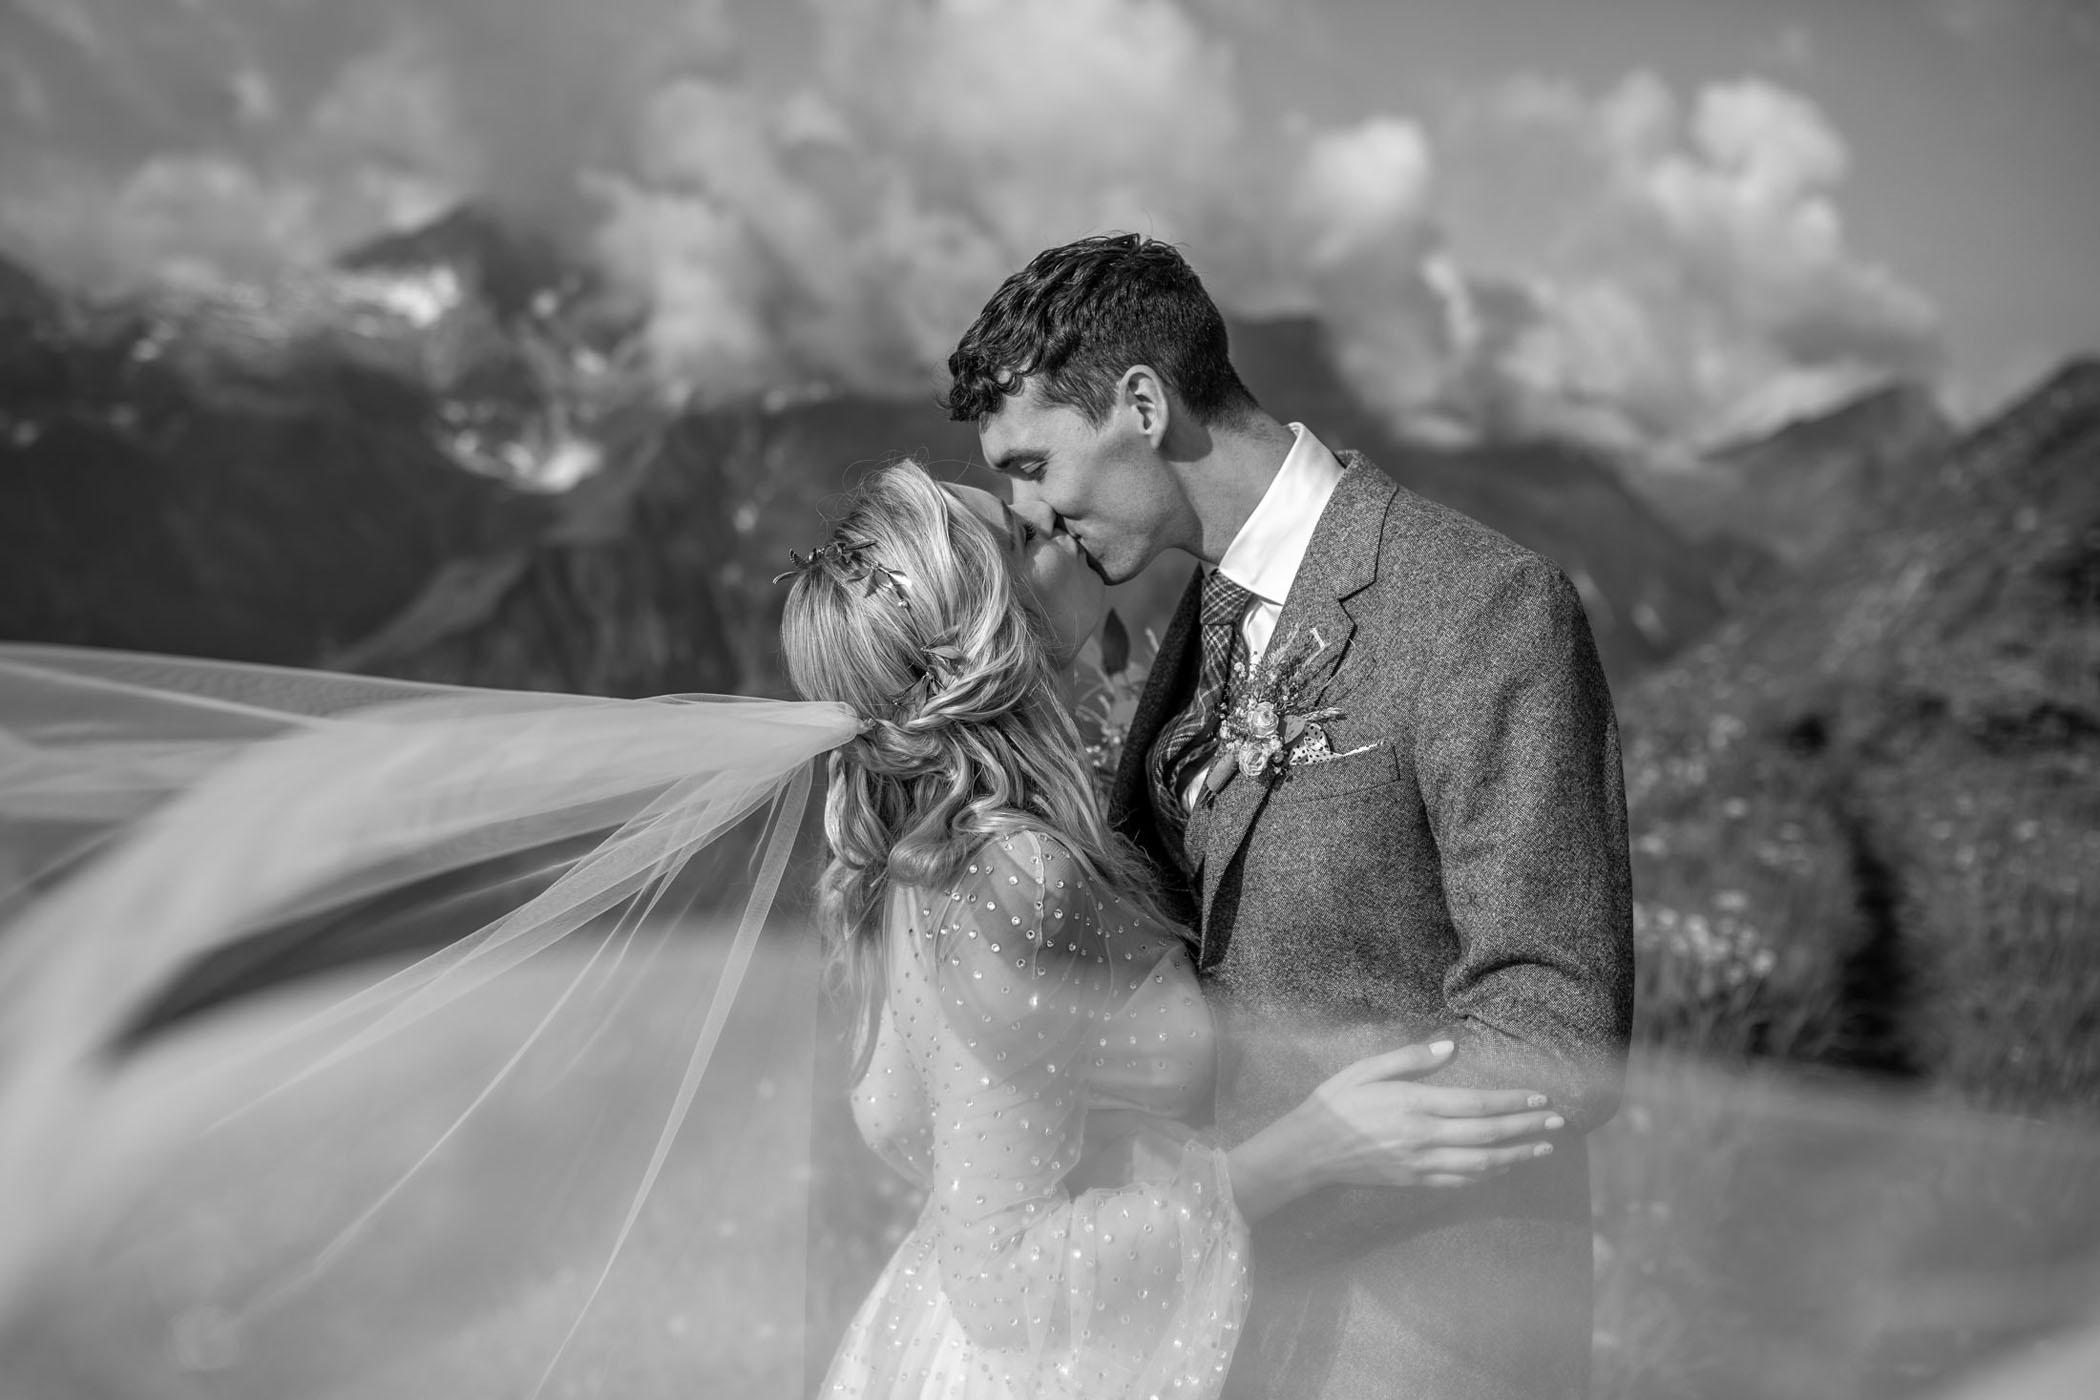 Brides's veil flows in the wind